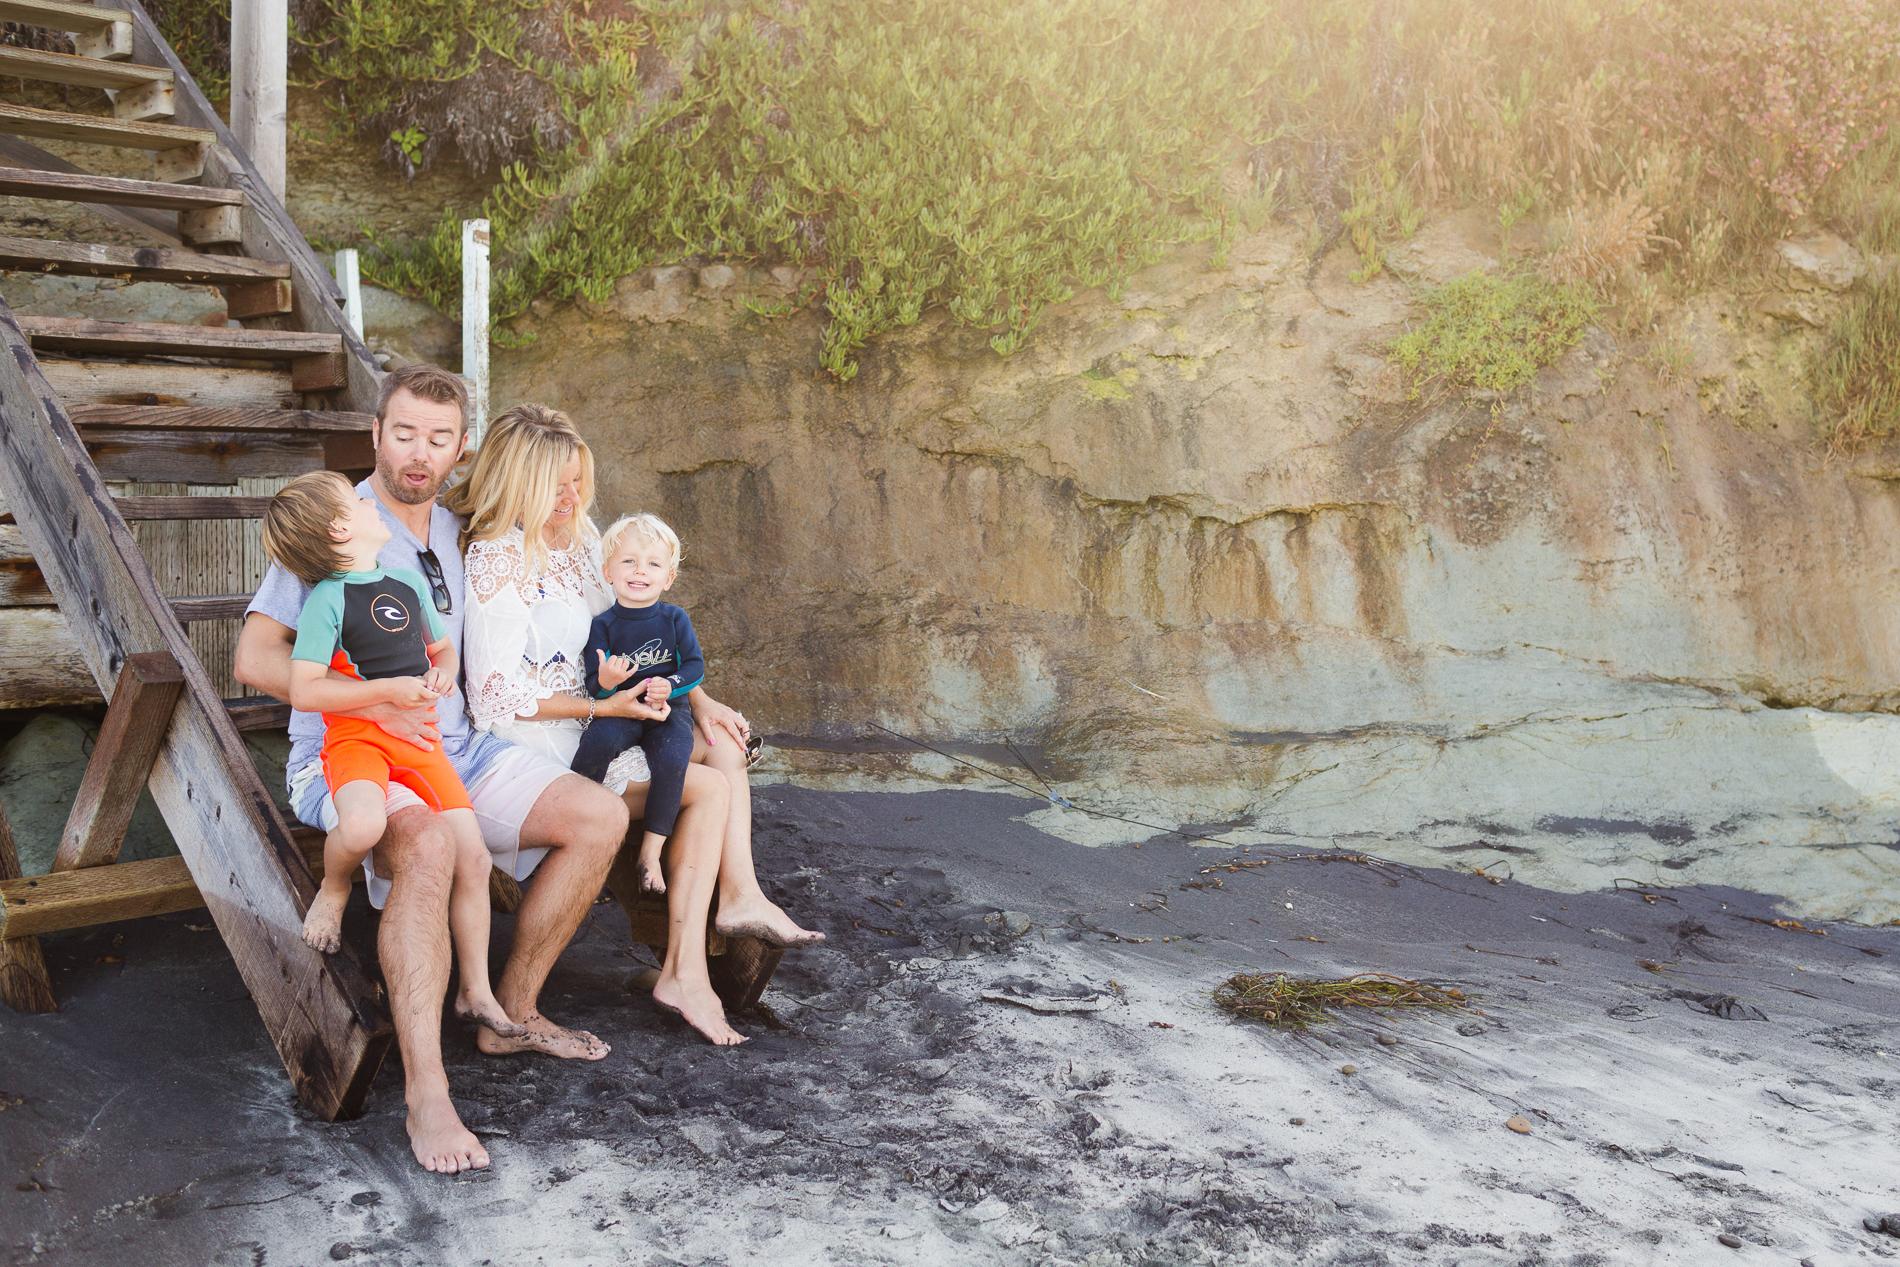 Encinitas Family Photographer | Christine Dammann Photography 2017 | Family at Grandview Beach